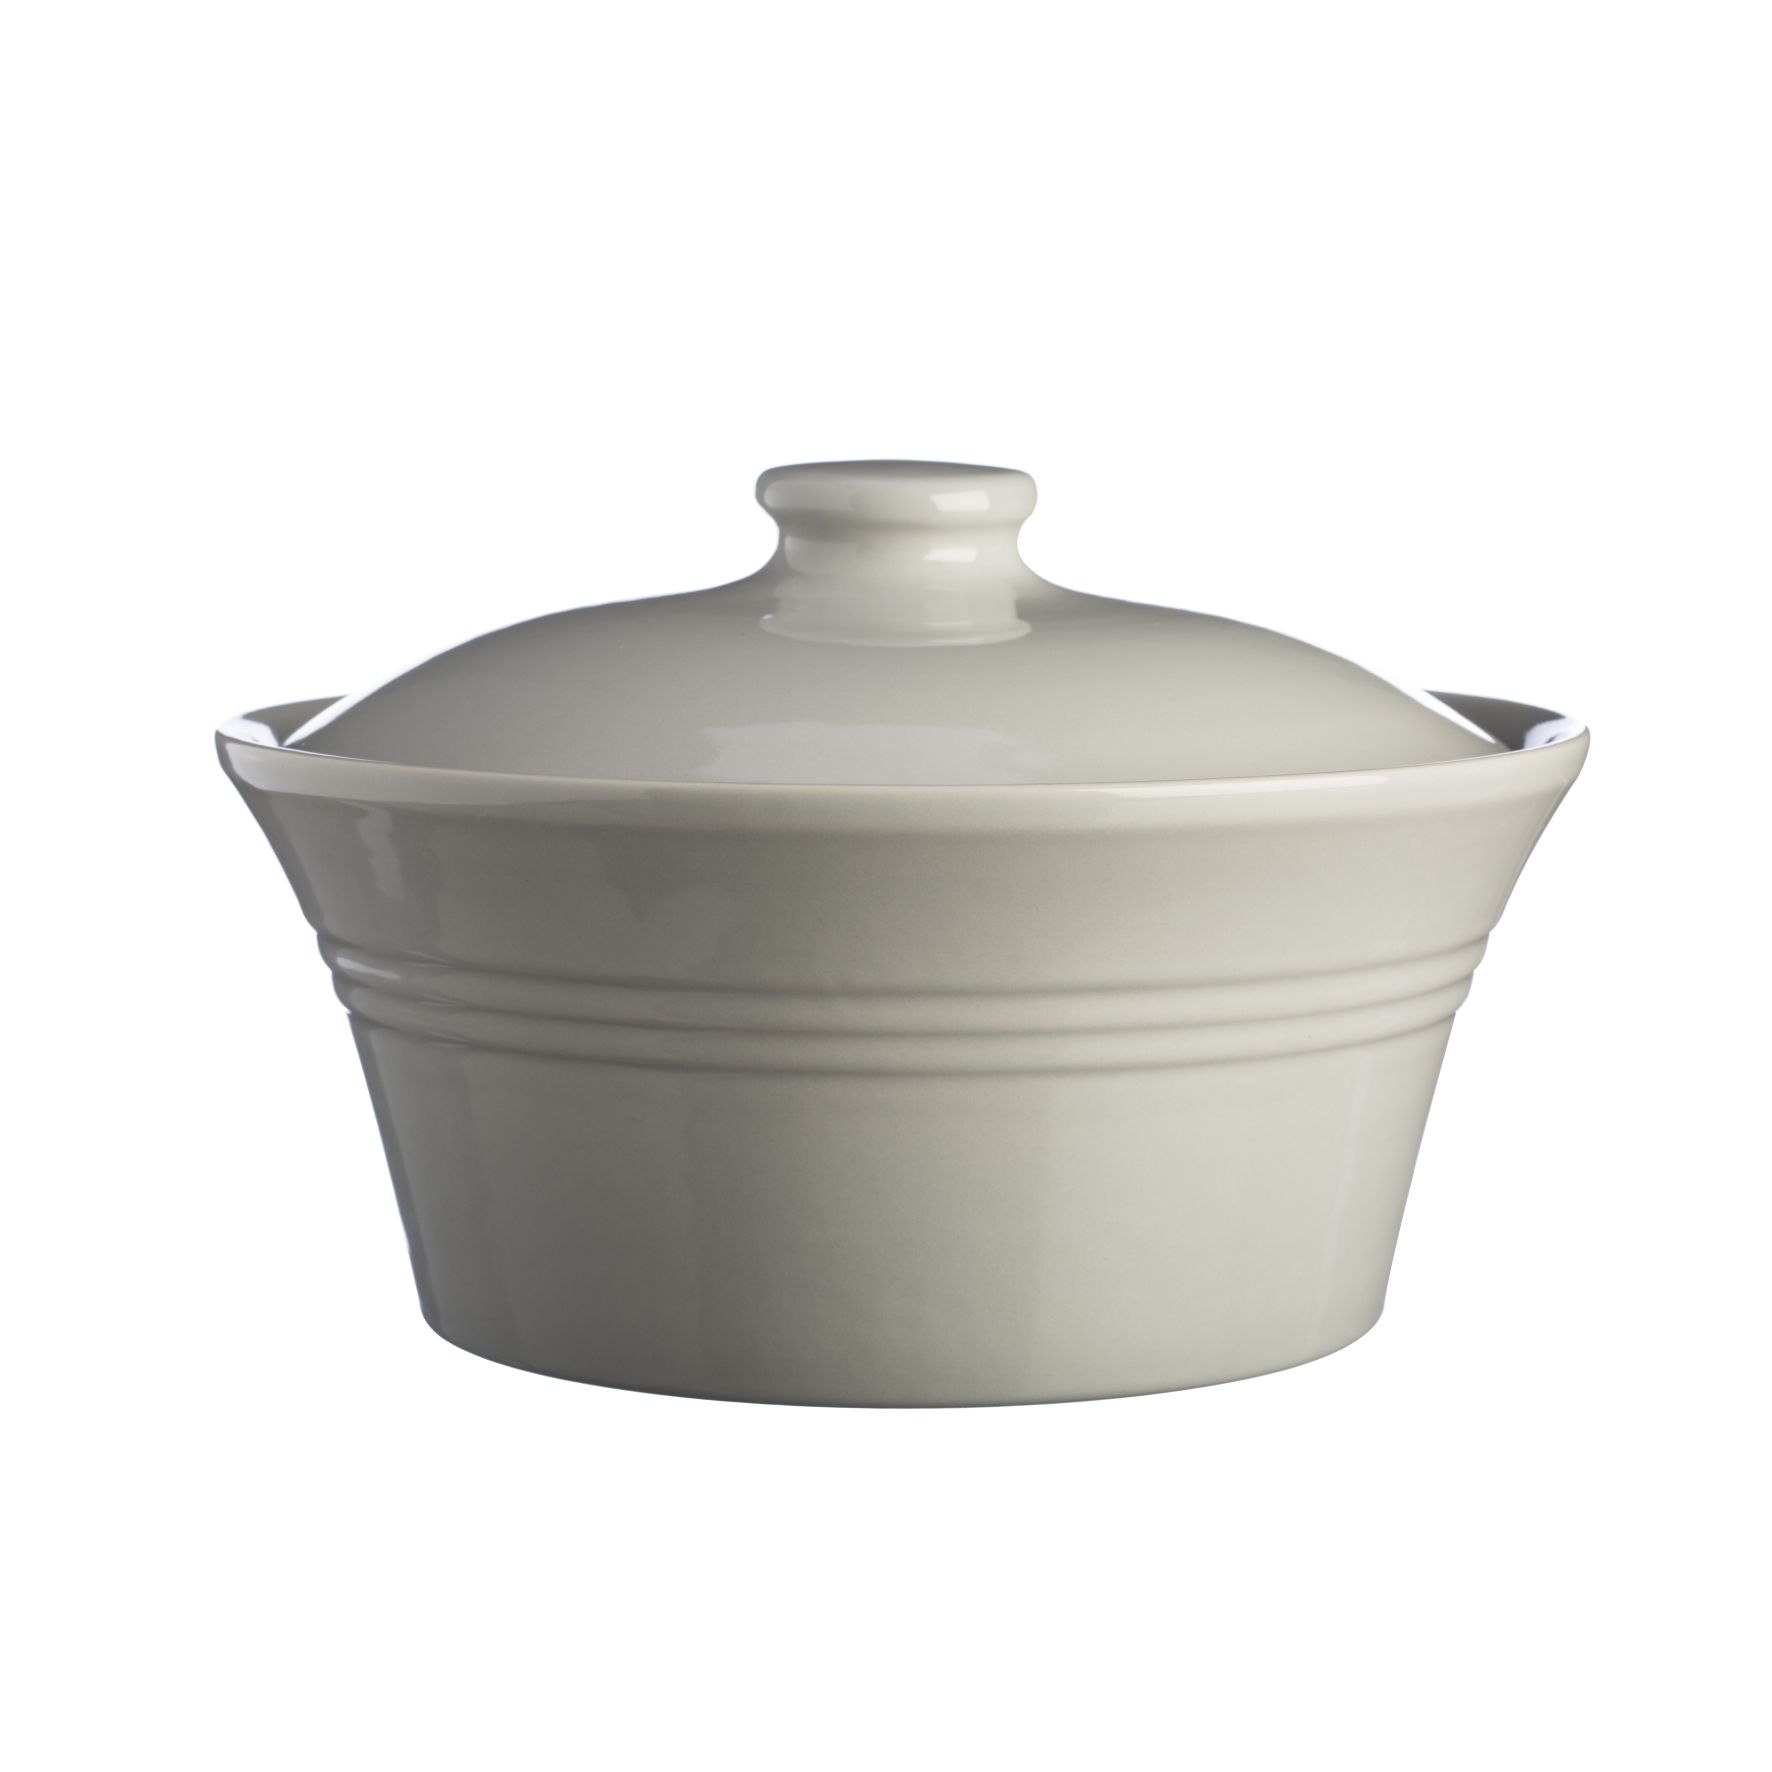 Kastrol s poklicí Grey 25,5x25,5 cm - 2,5l Classic Kitchen - Mason Cash